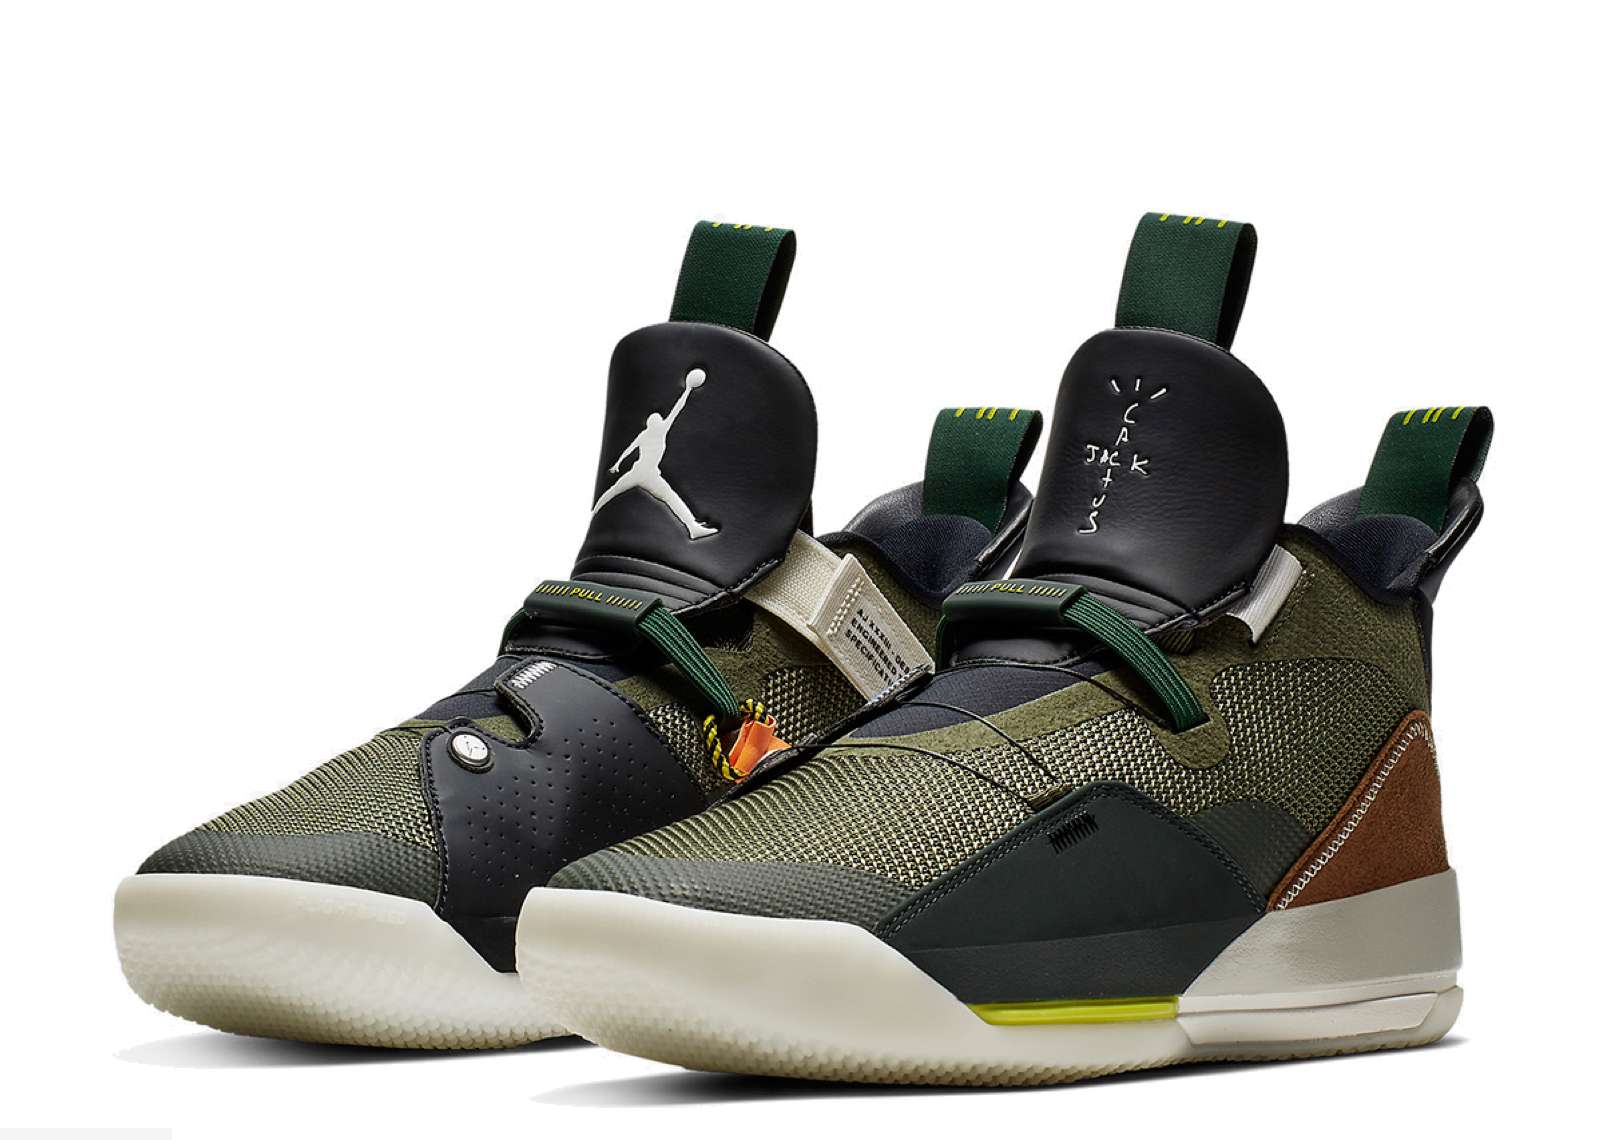 e493731d58e108 Kick Avenue - Authentic Sneakers